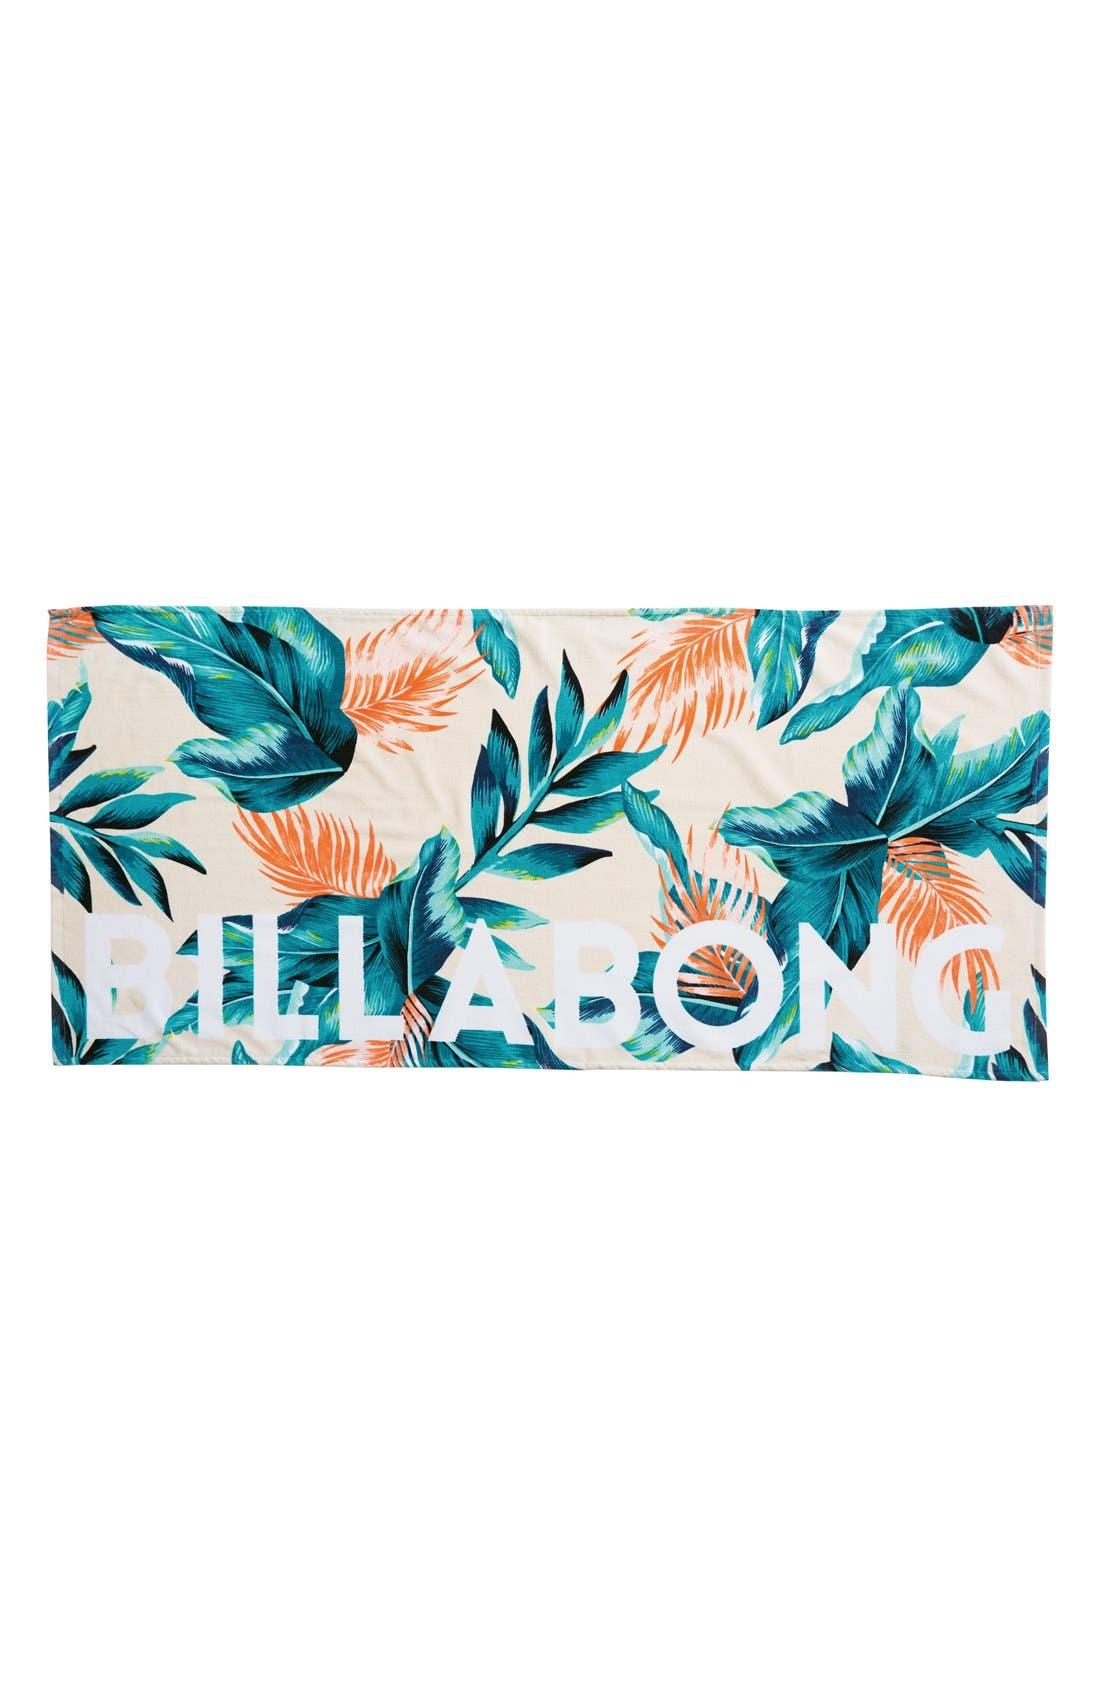 Main Image - Billabong 'Sunset Sounds' Cotton Terry Beach Towel